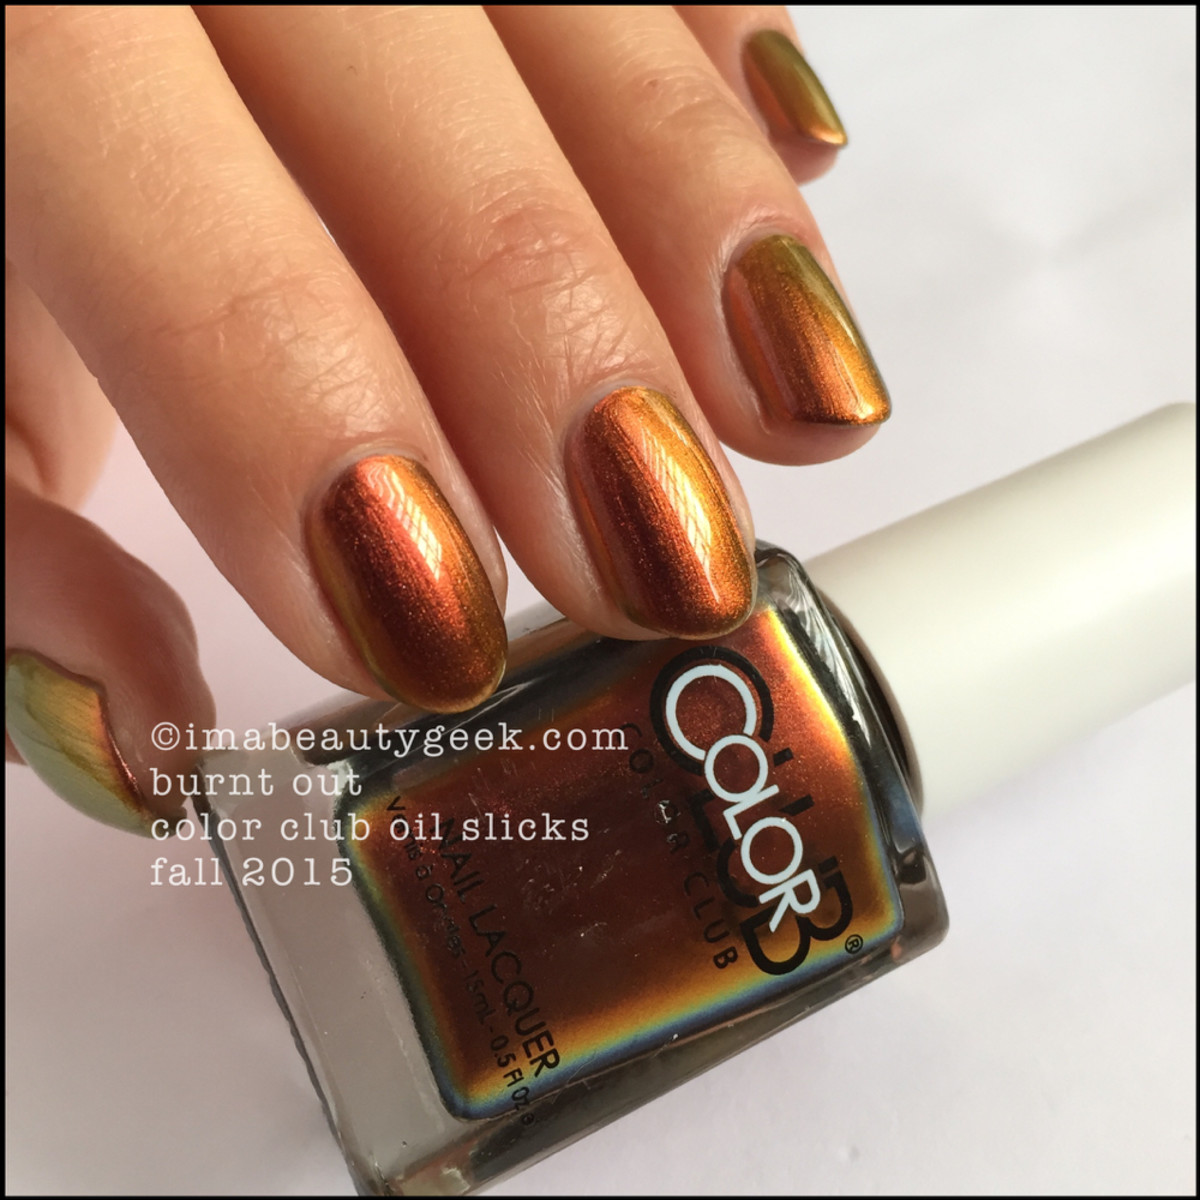 Color Club Oil Slicks_Color Club Burnt Out_3